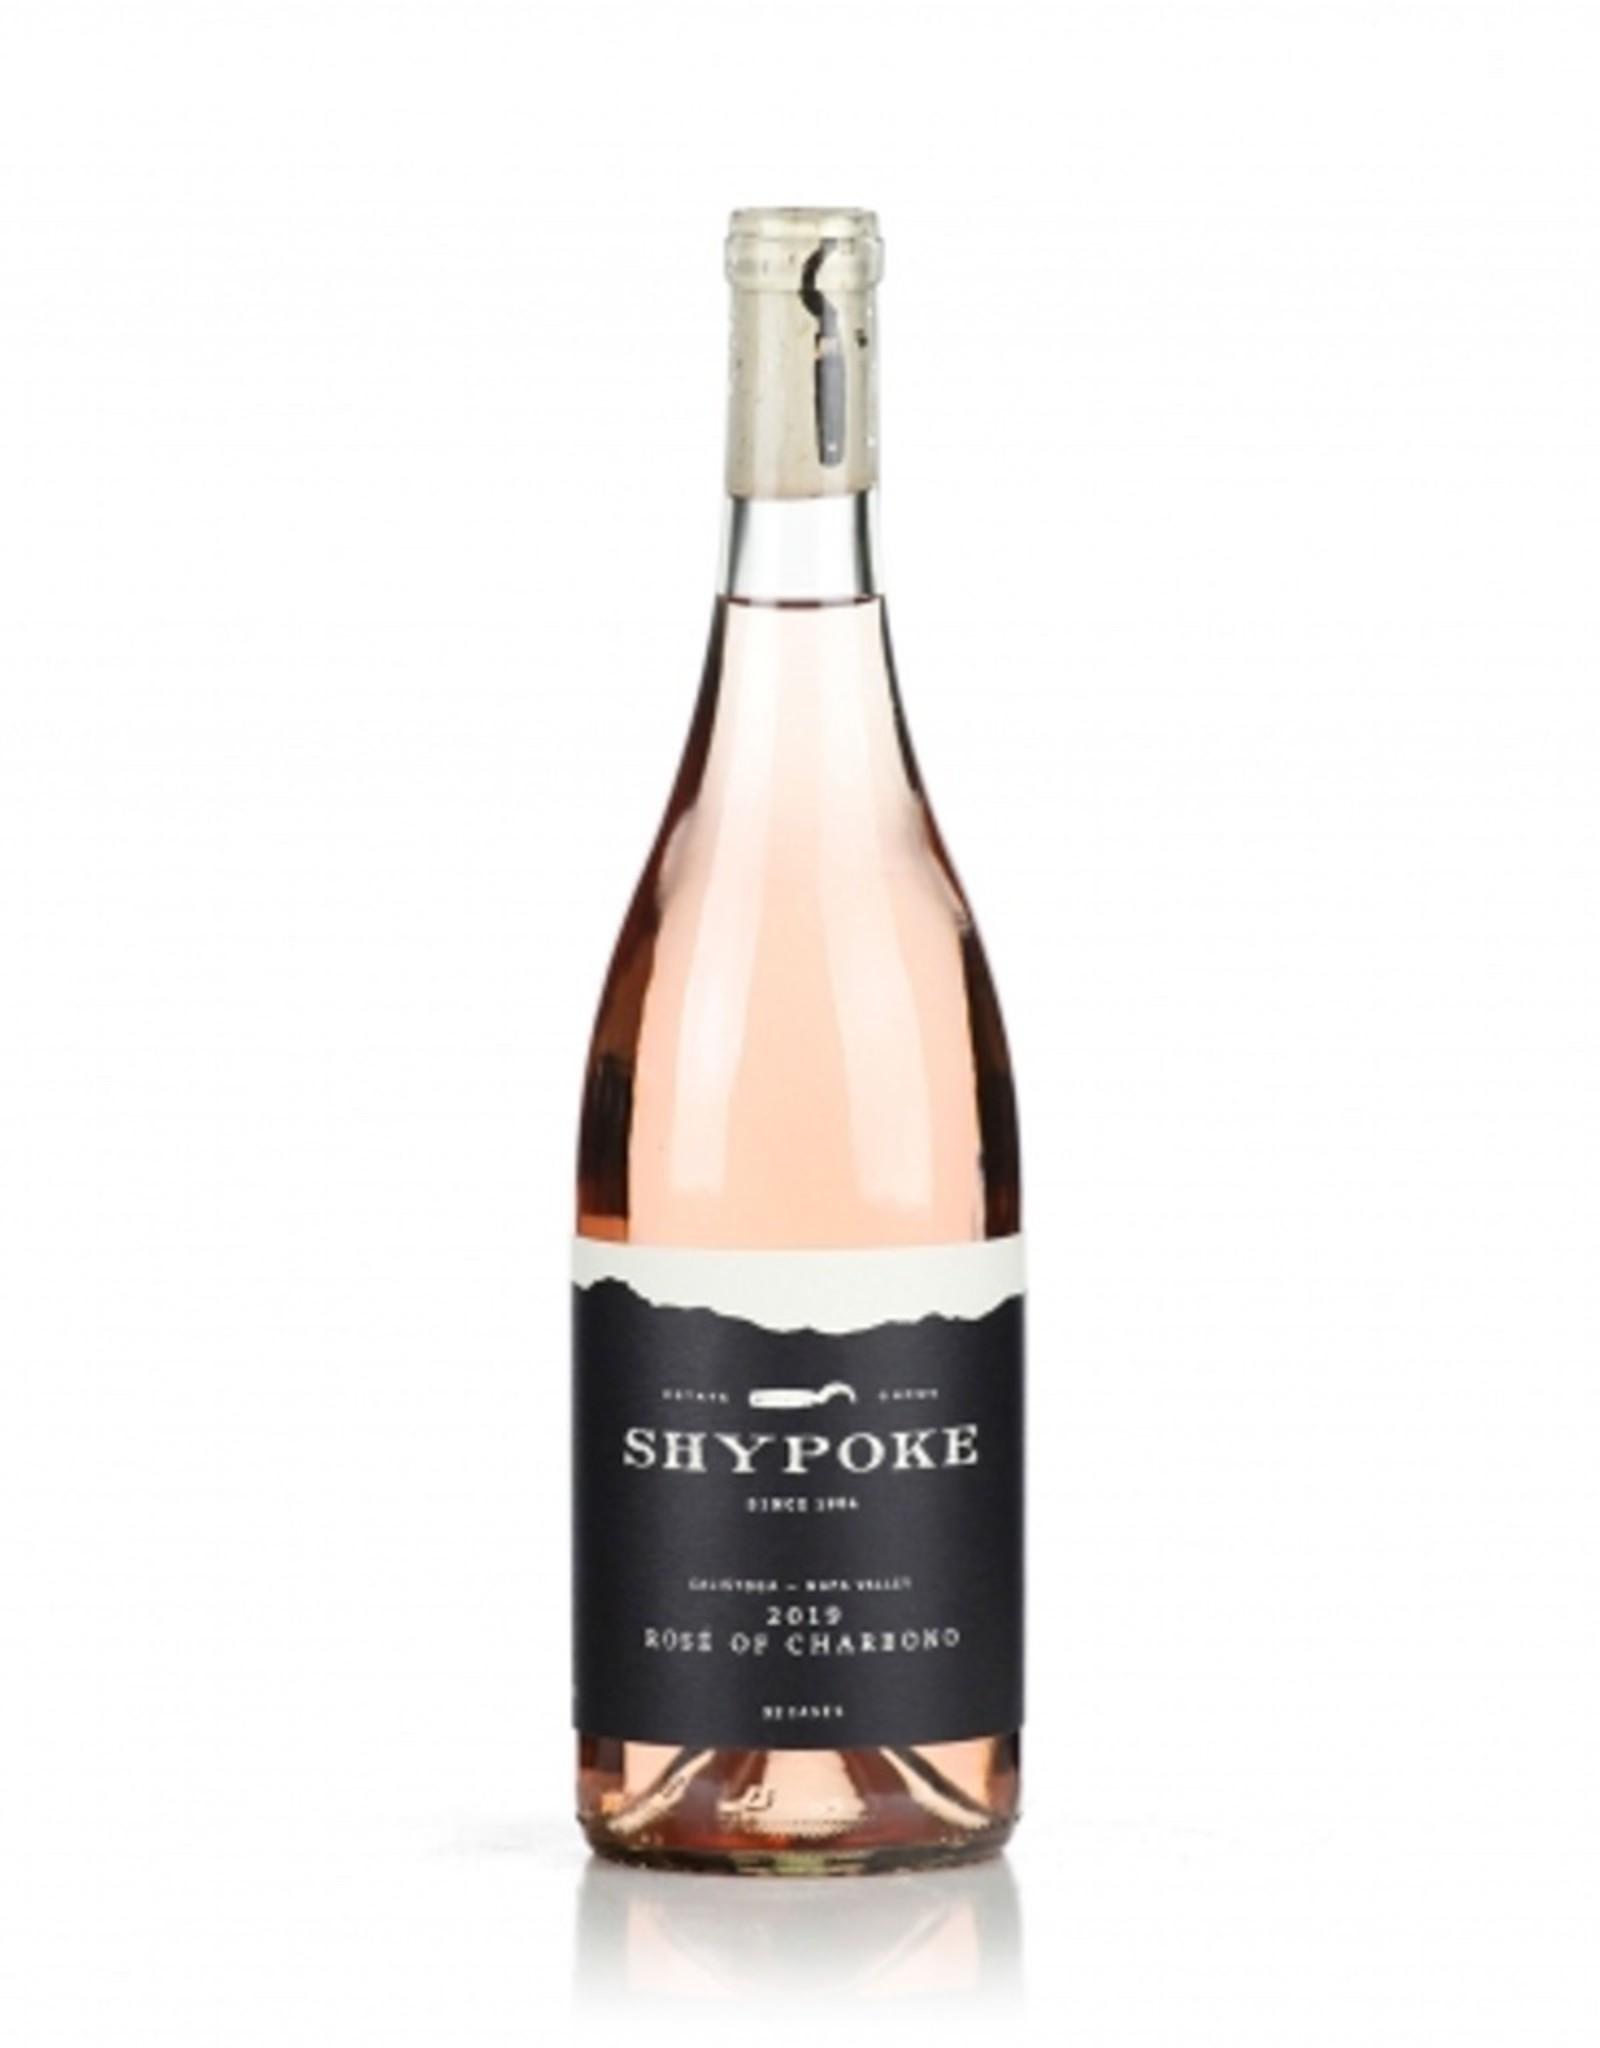 Shypoke Winery Shypoke Rose of Charbono Calistoga Napa 2020